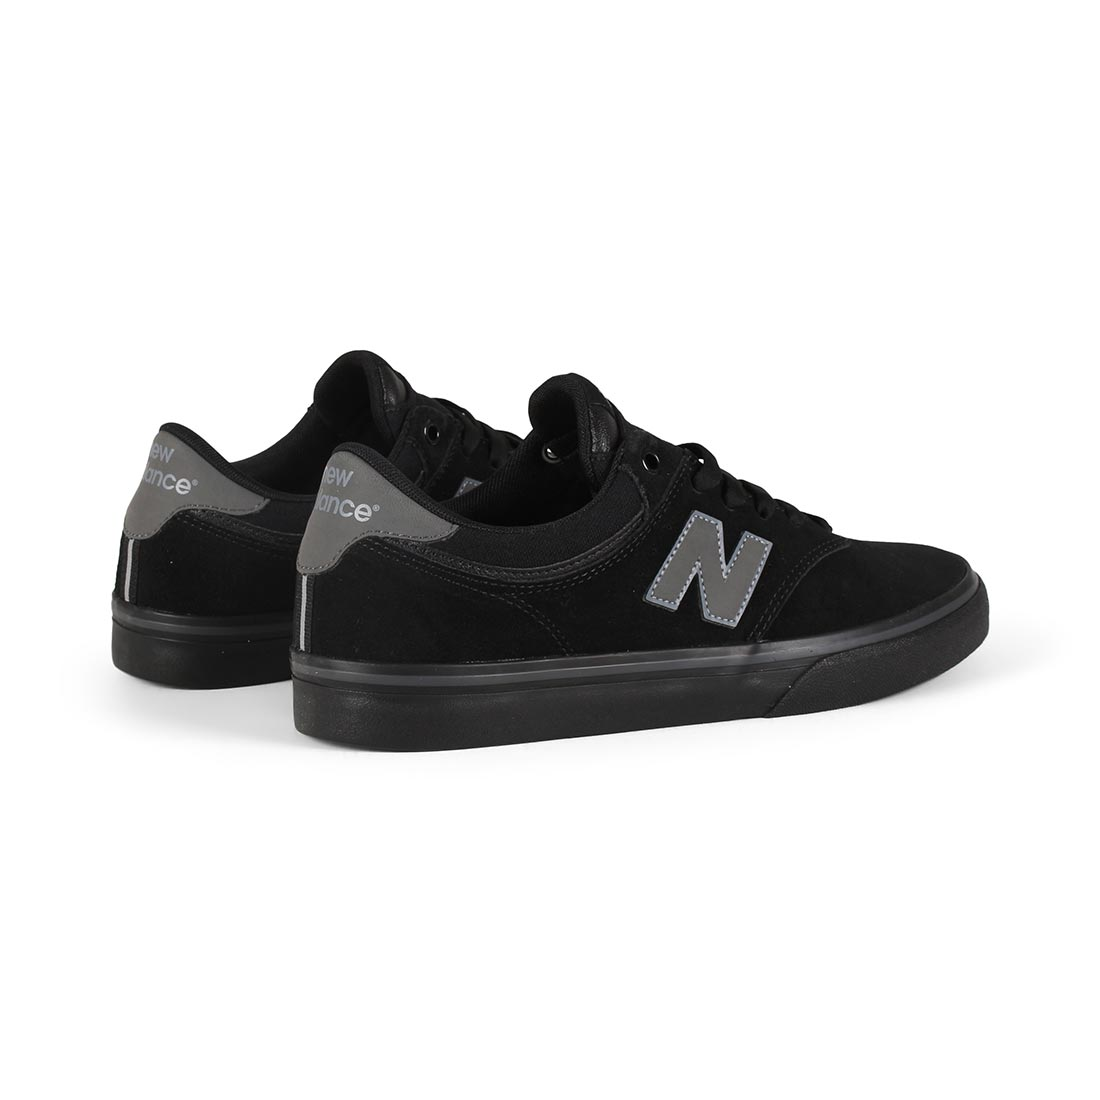 New Balance Numeric 255 Shoes - Black / Black